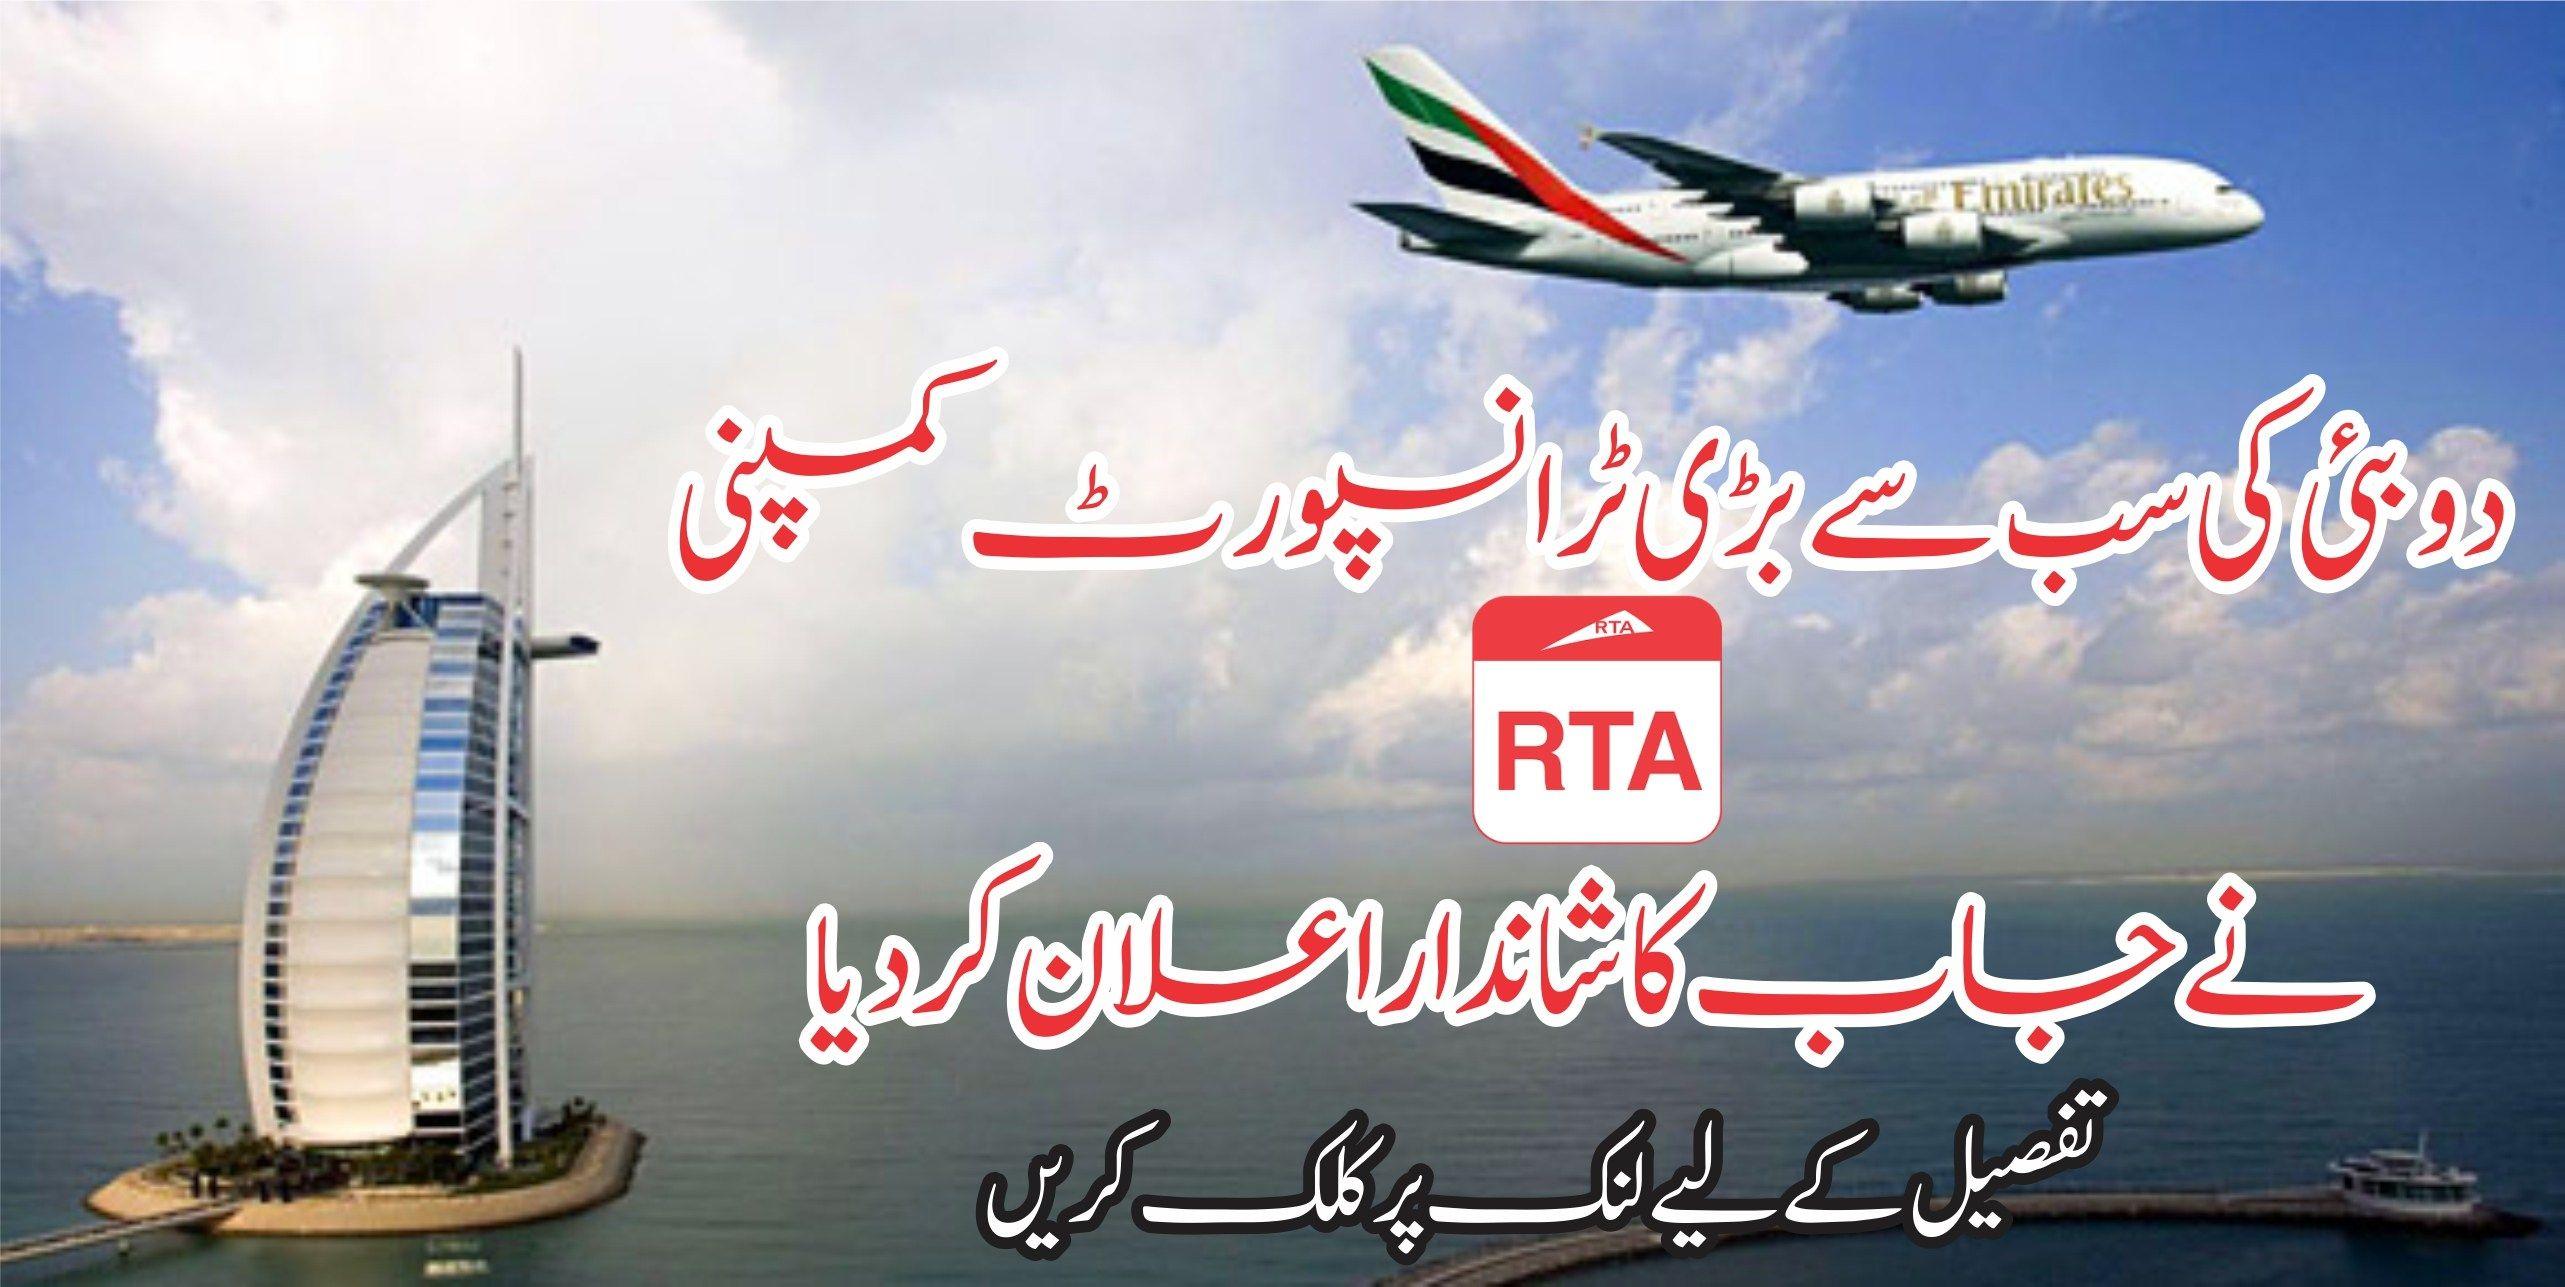 You want work in Dubai, RTA Dubai is hiring keep your